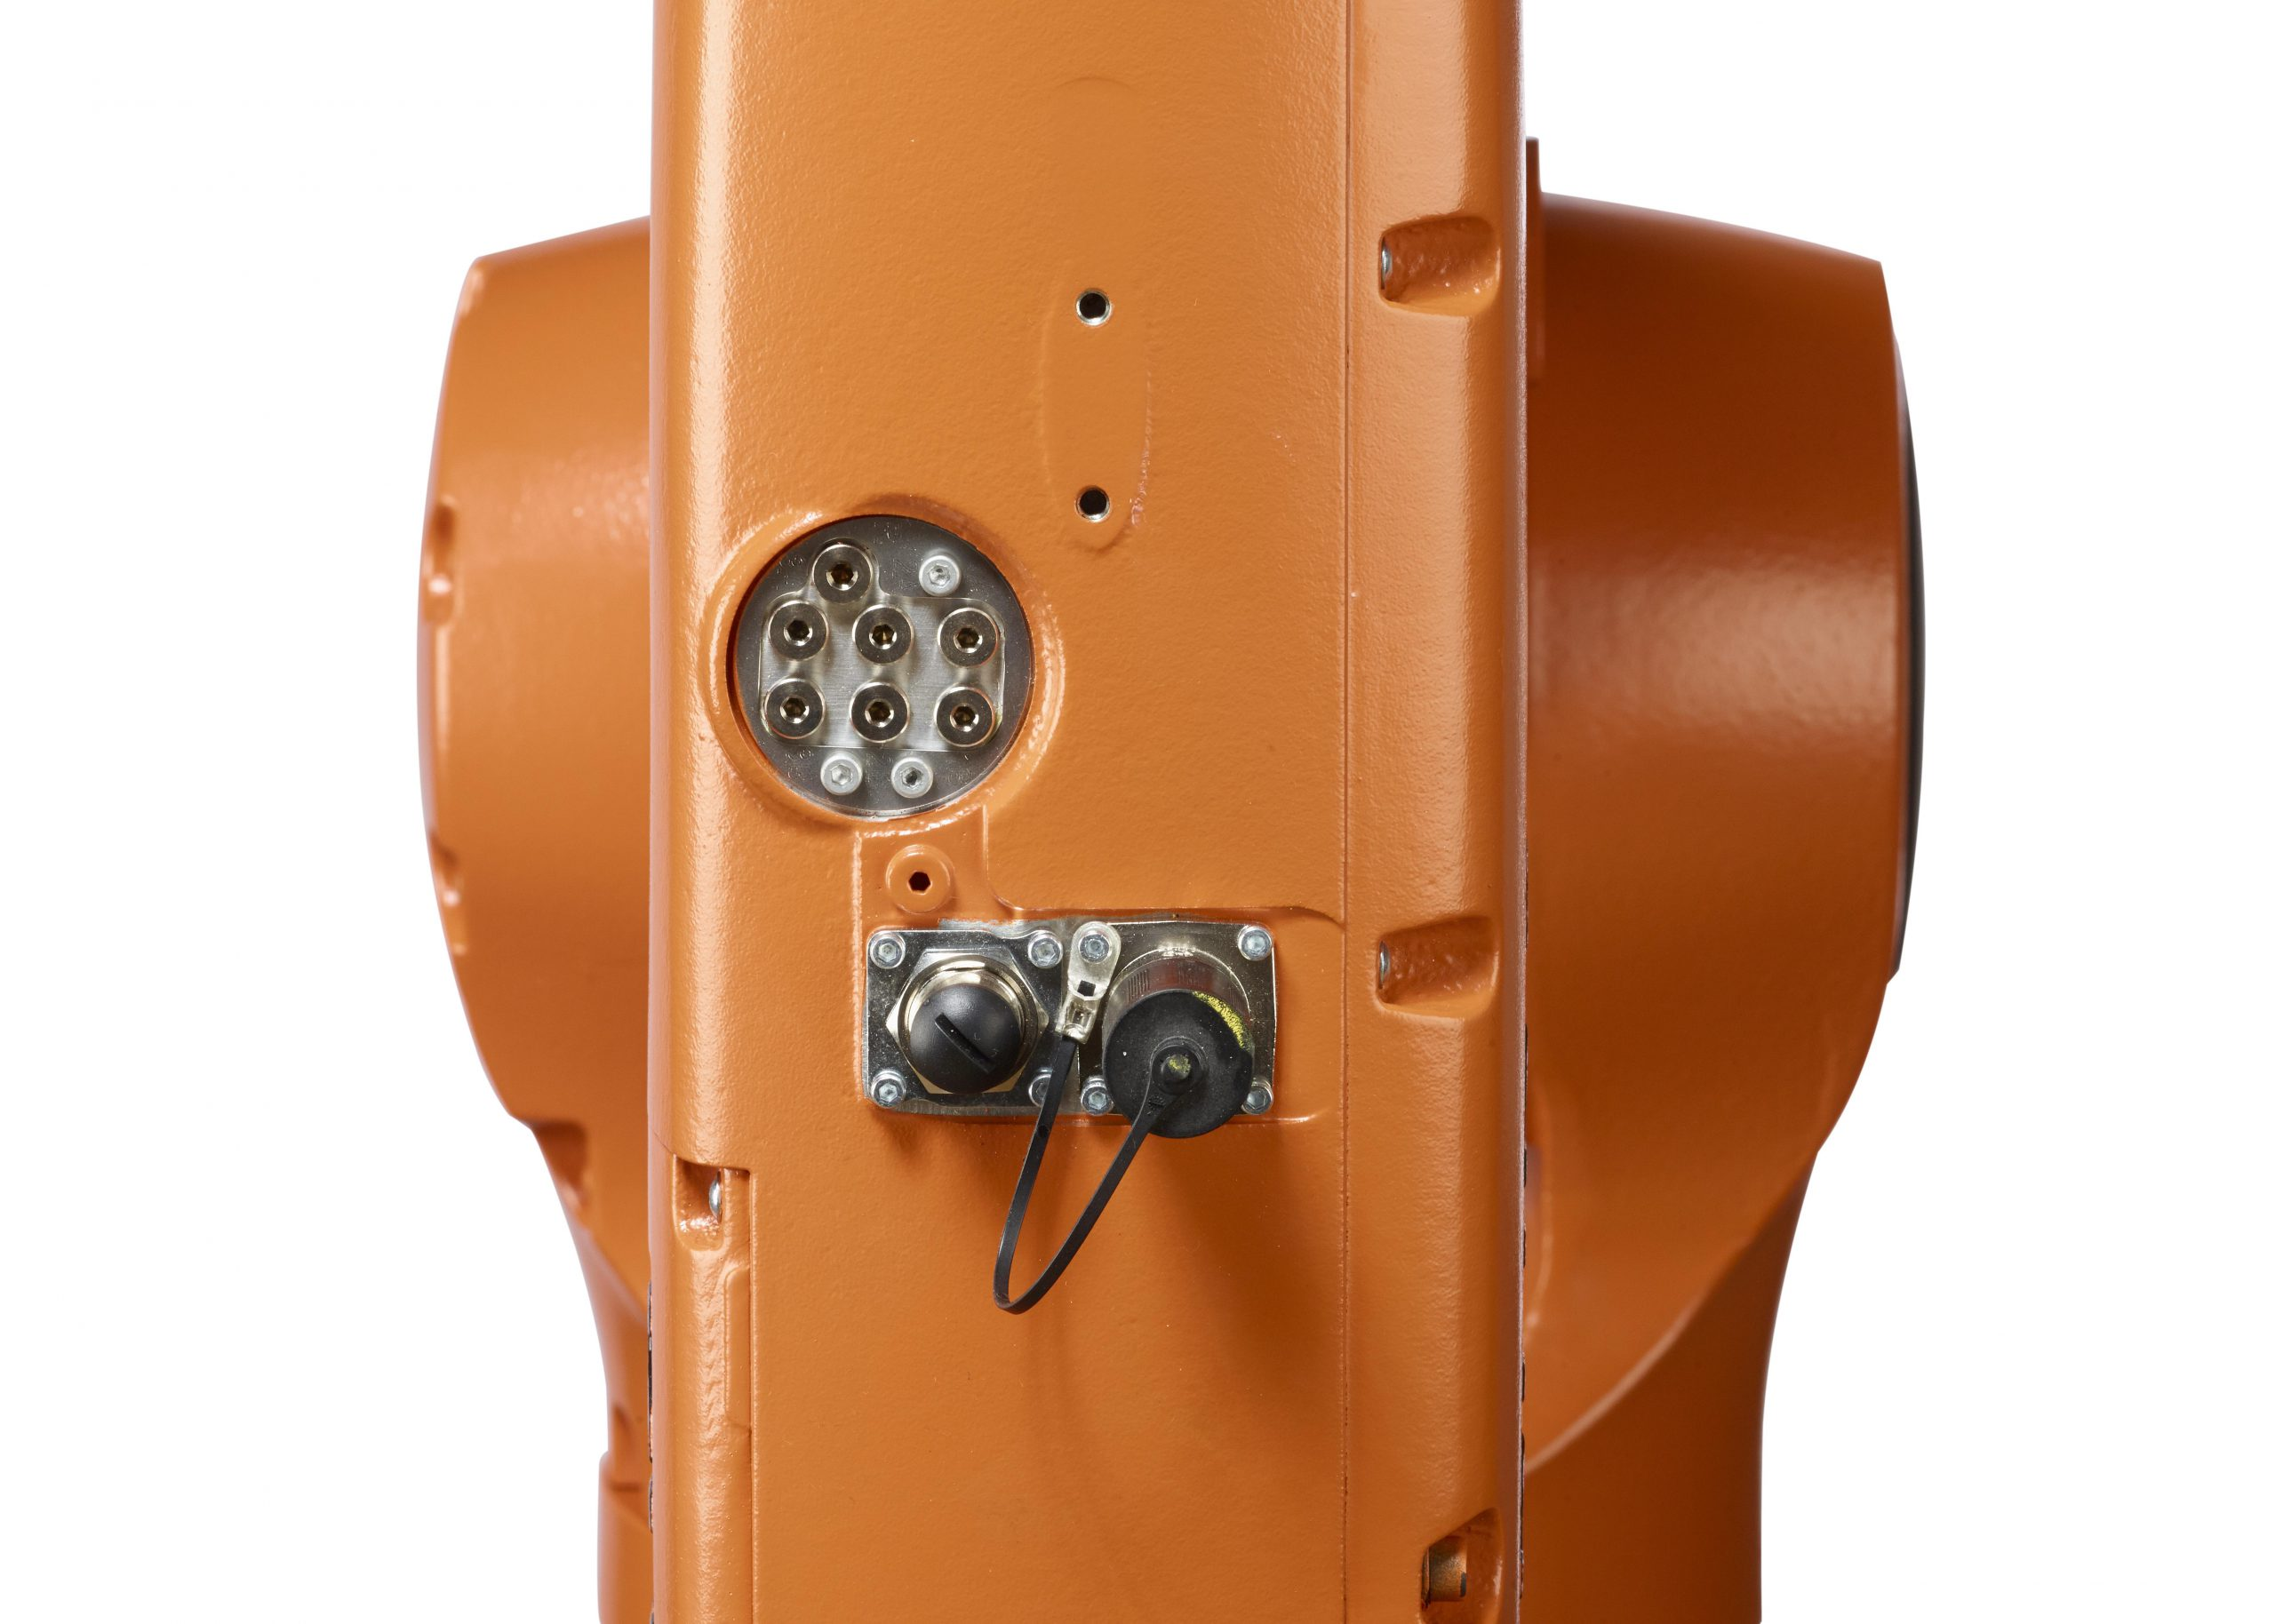 KUKA KR 10 R900 sixx WP (KR AGILUS)-9